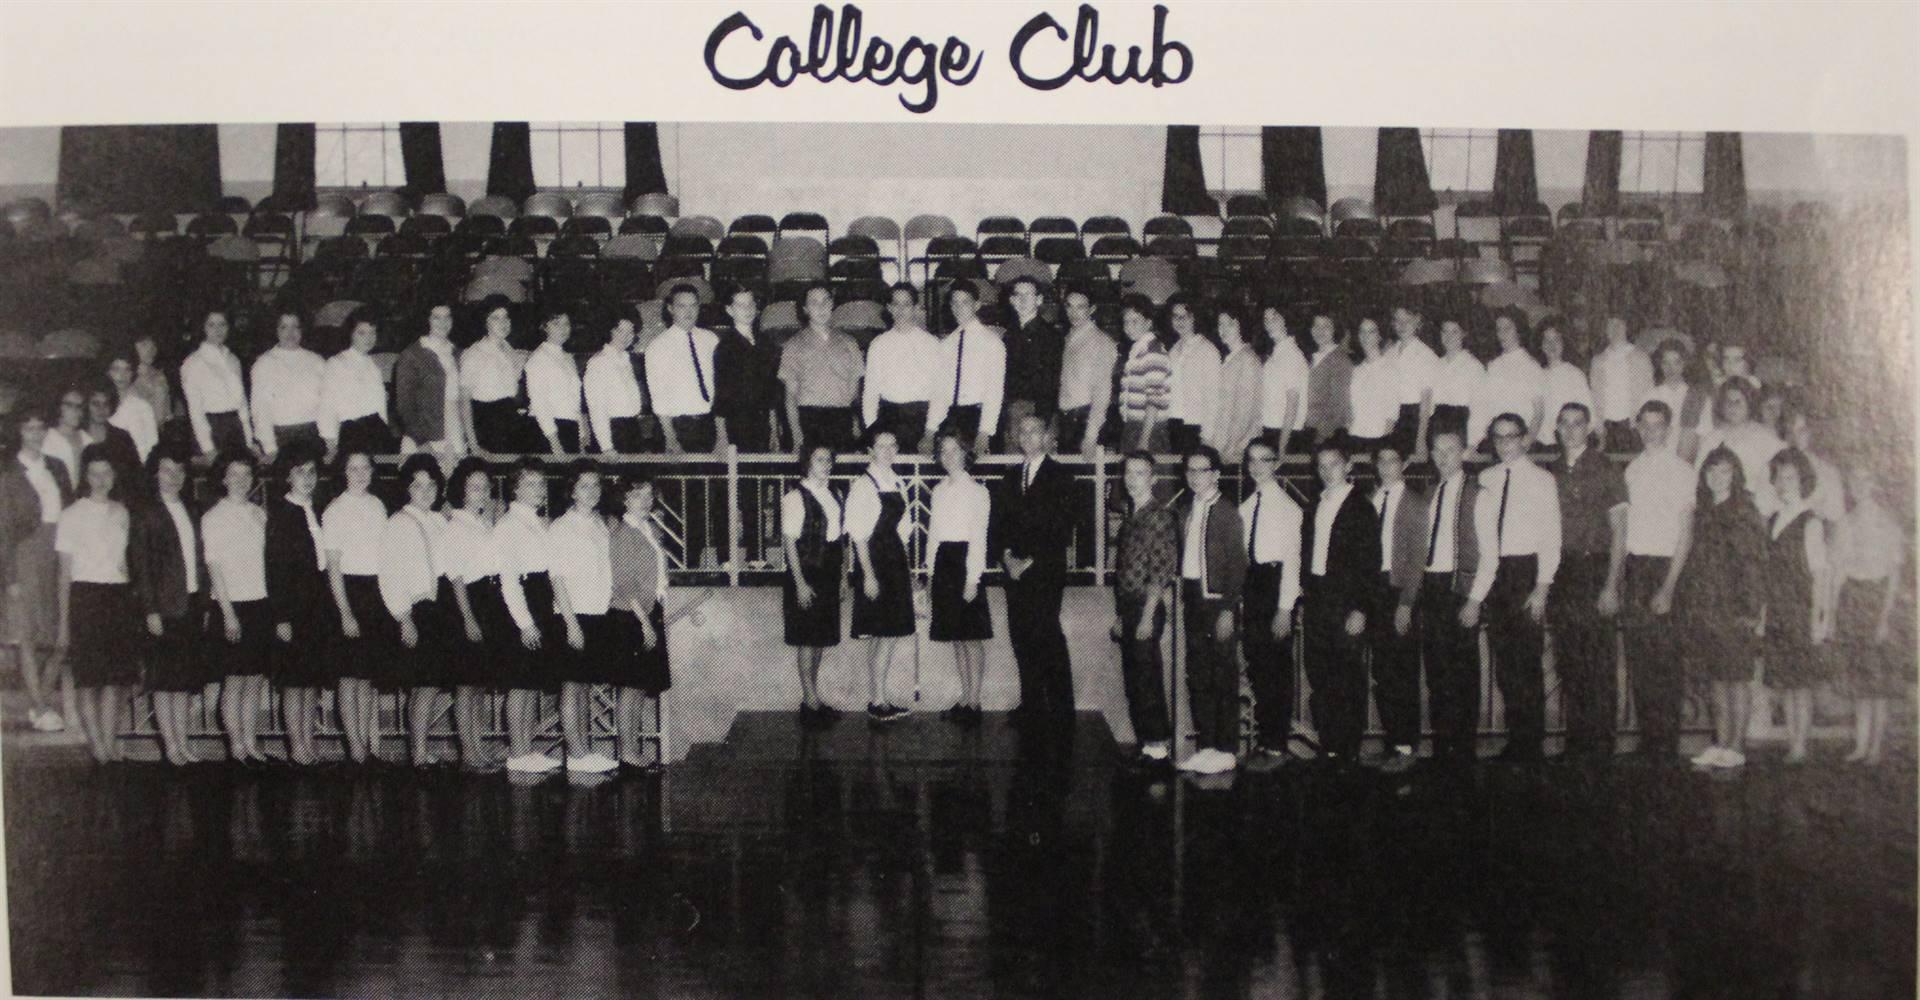 1964 College Club